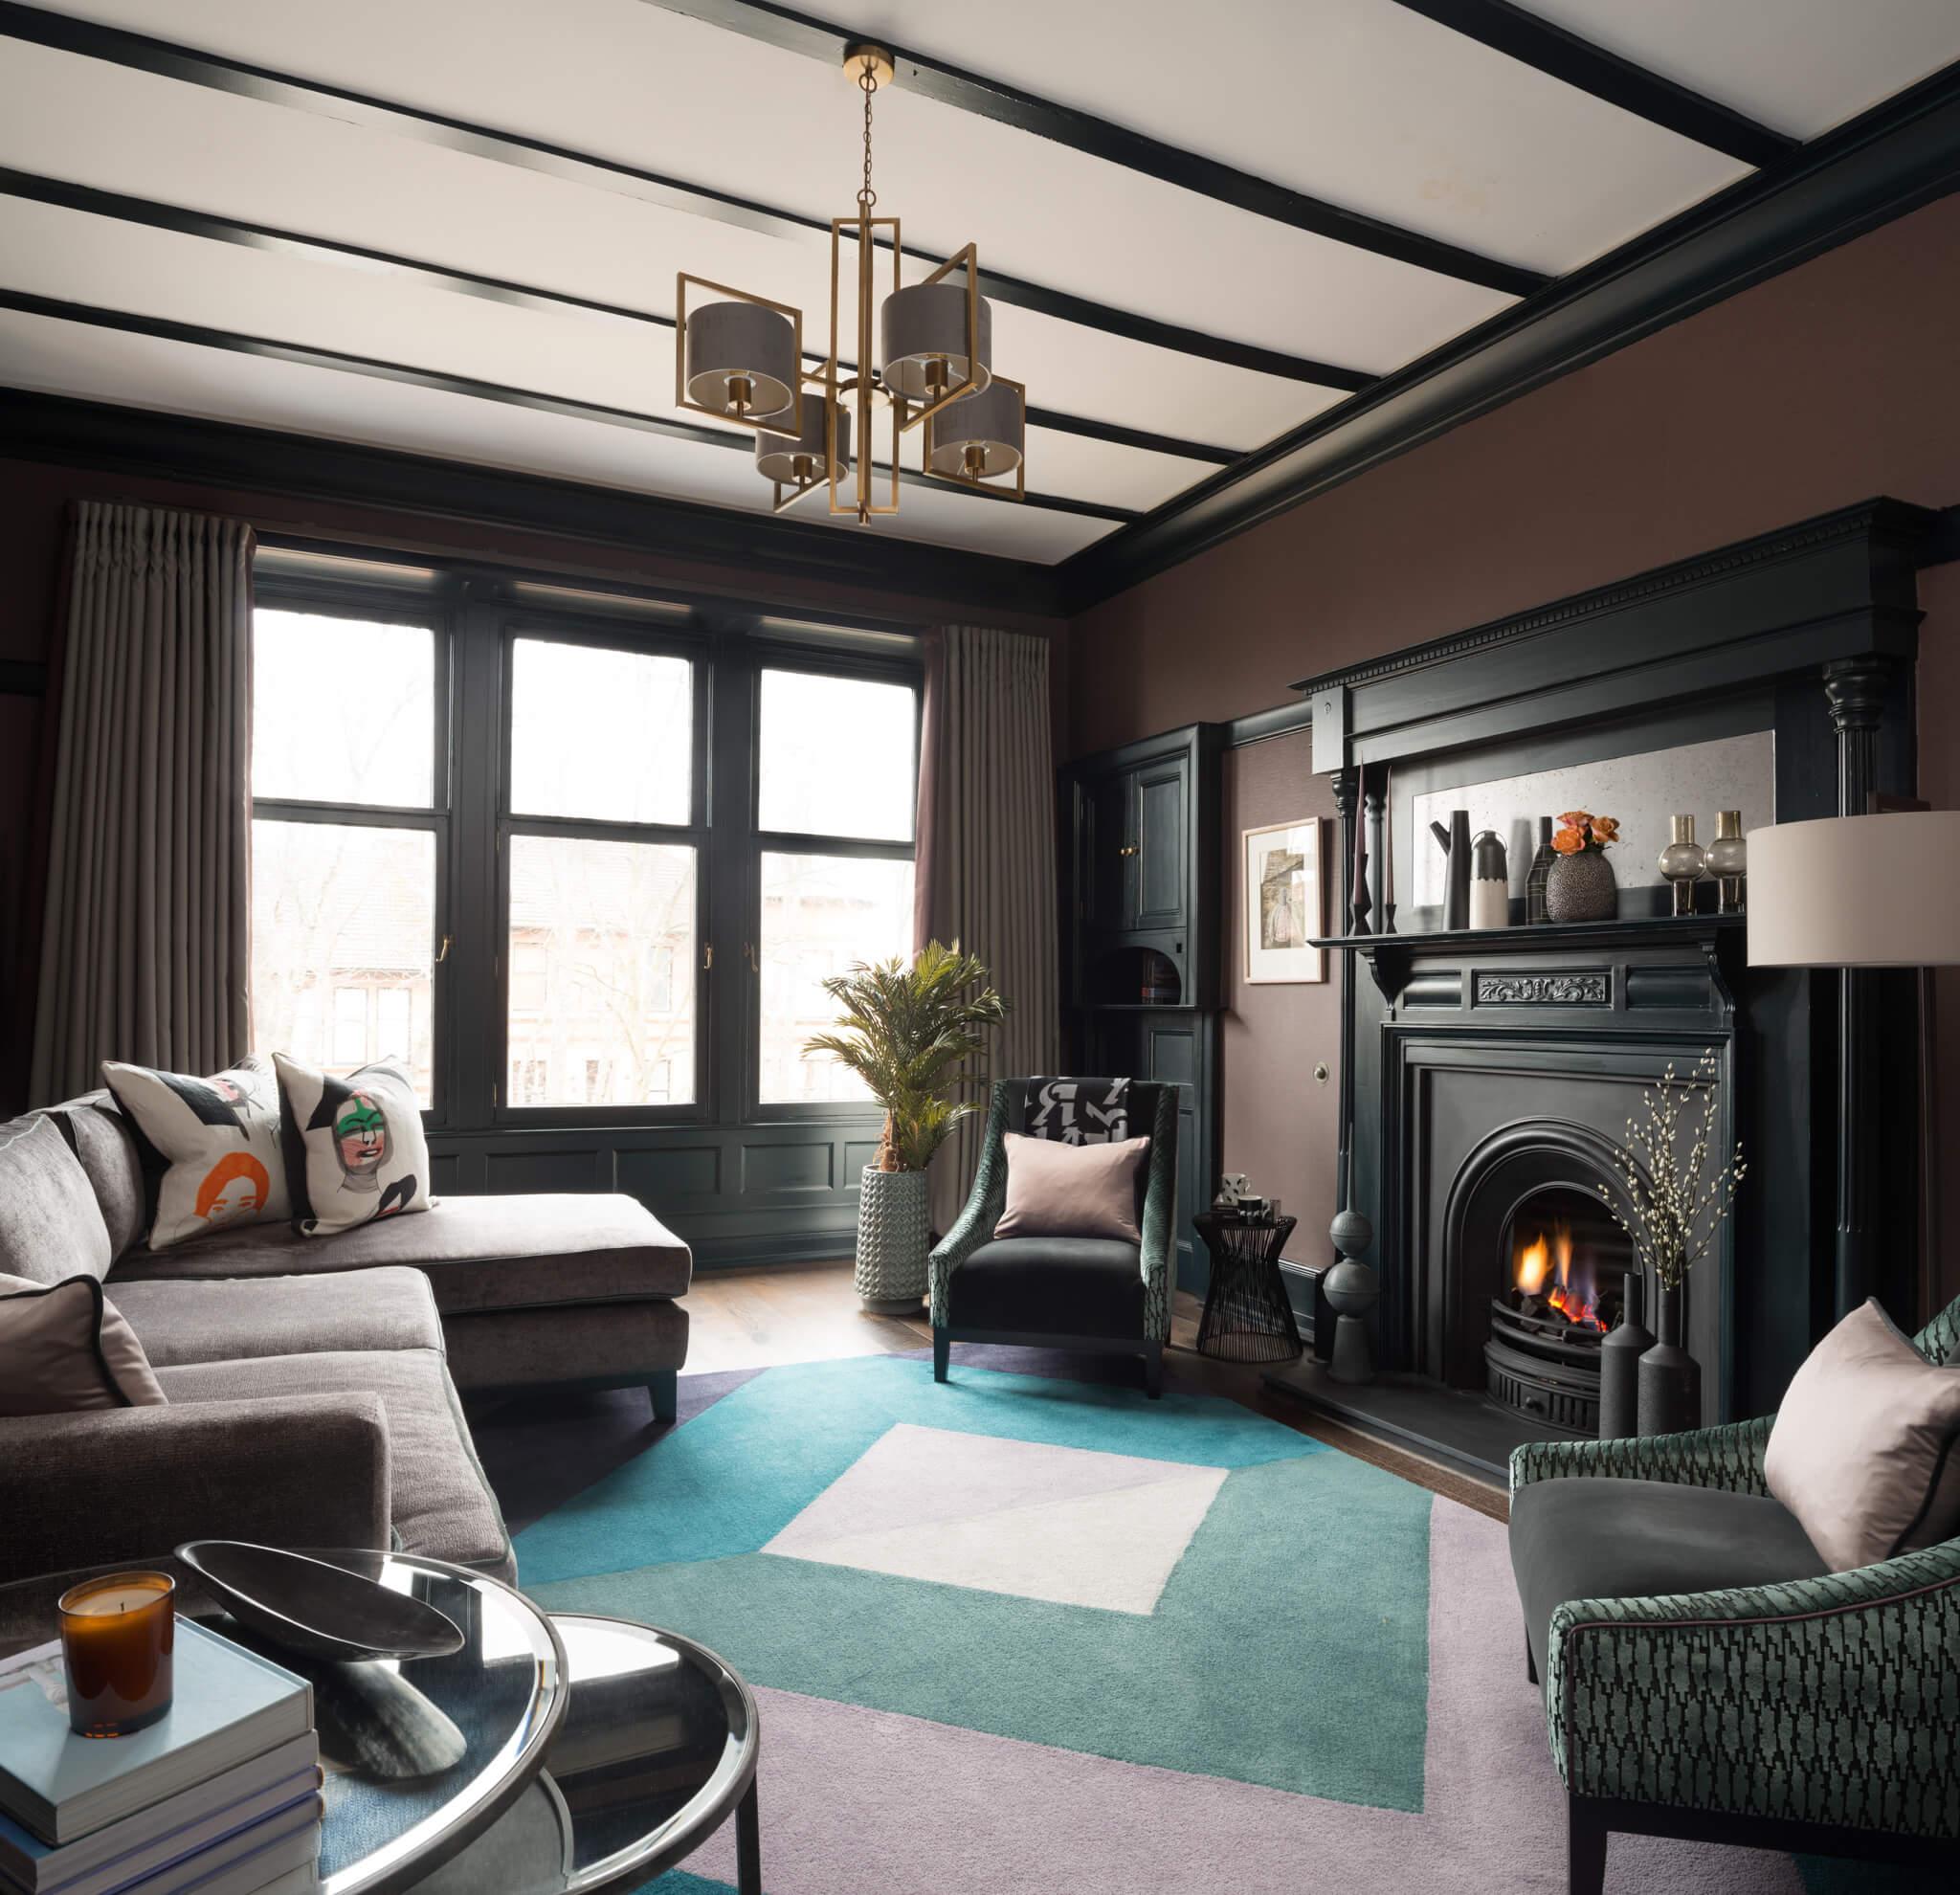 Print-Livingroom-Overview-Chelsea-Mclaine-Interiors-Introductory-Shoot-©ZACandZAC